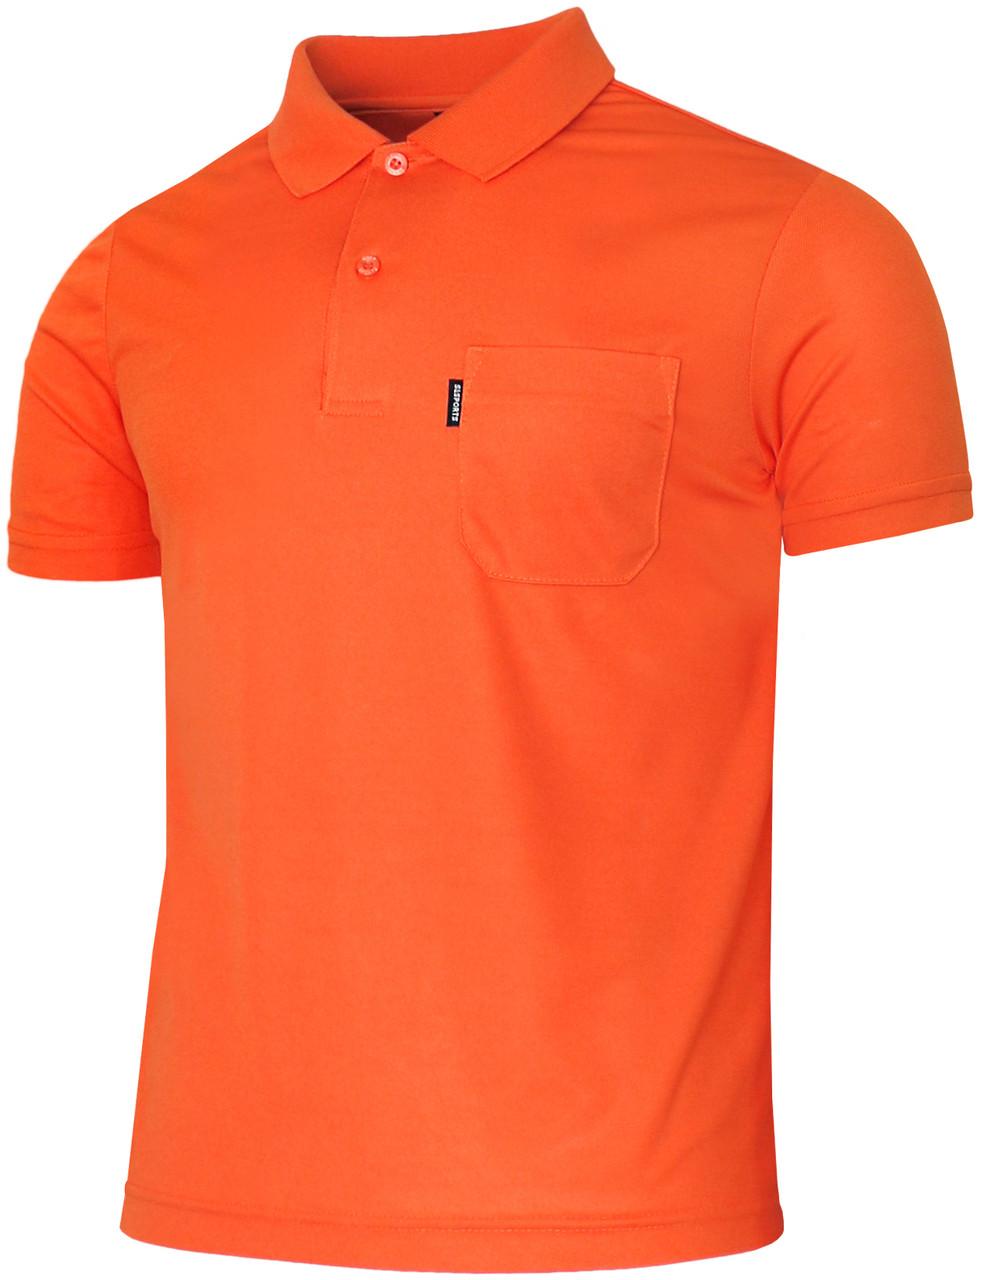 Coolon polo t shirt short sleeve t shirt aqua t shirt for Two color shirt design